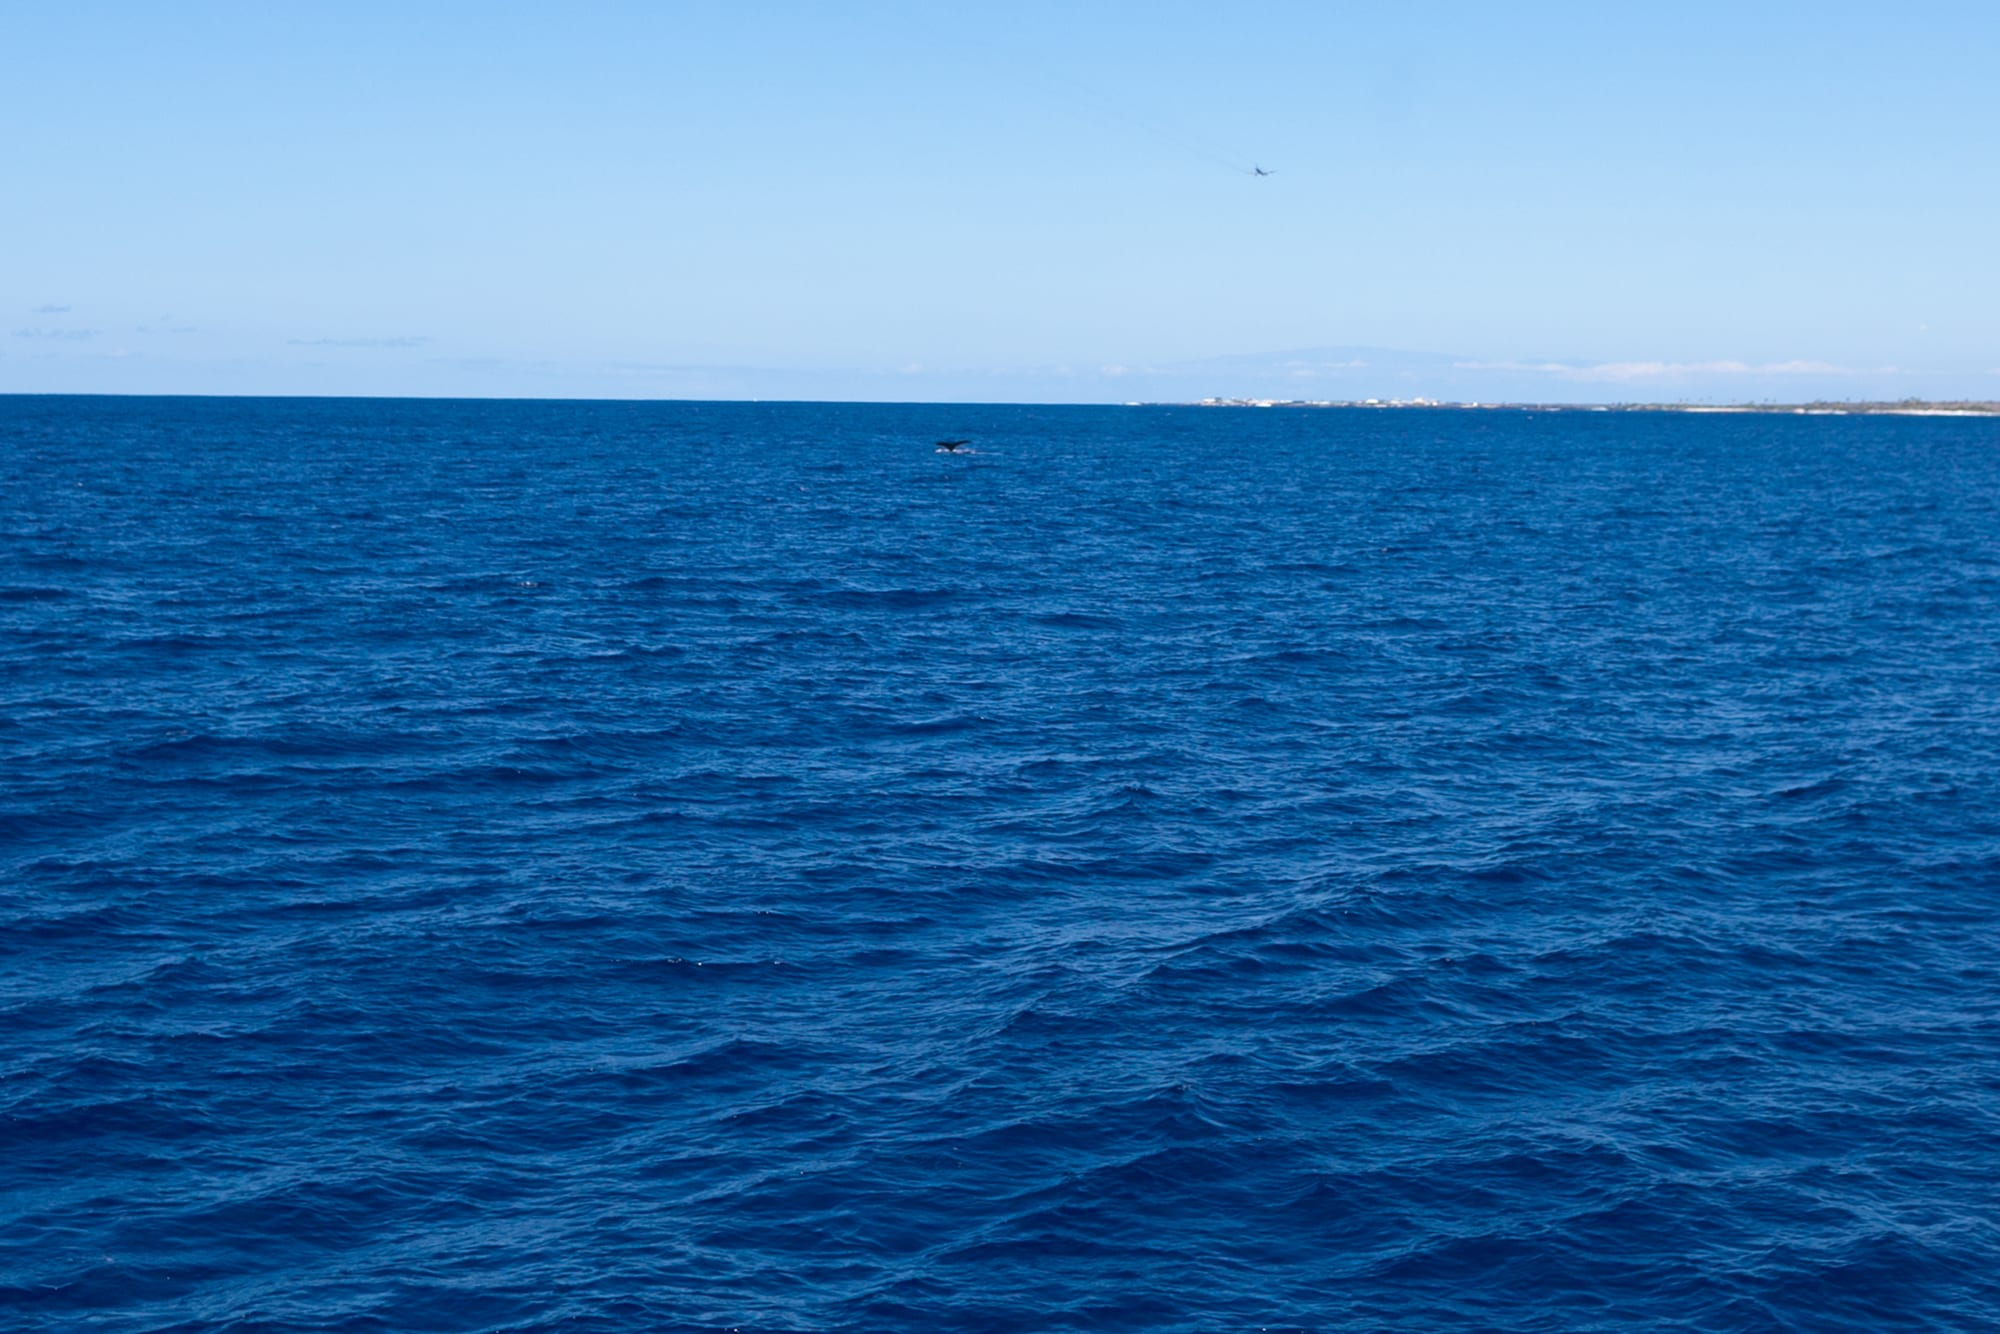 Whale watching in Kona on the Big Island in Hawaii.